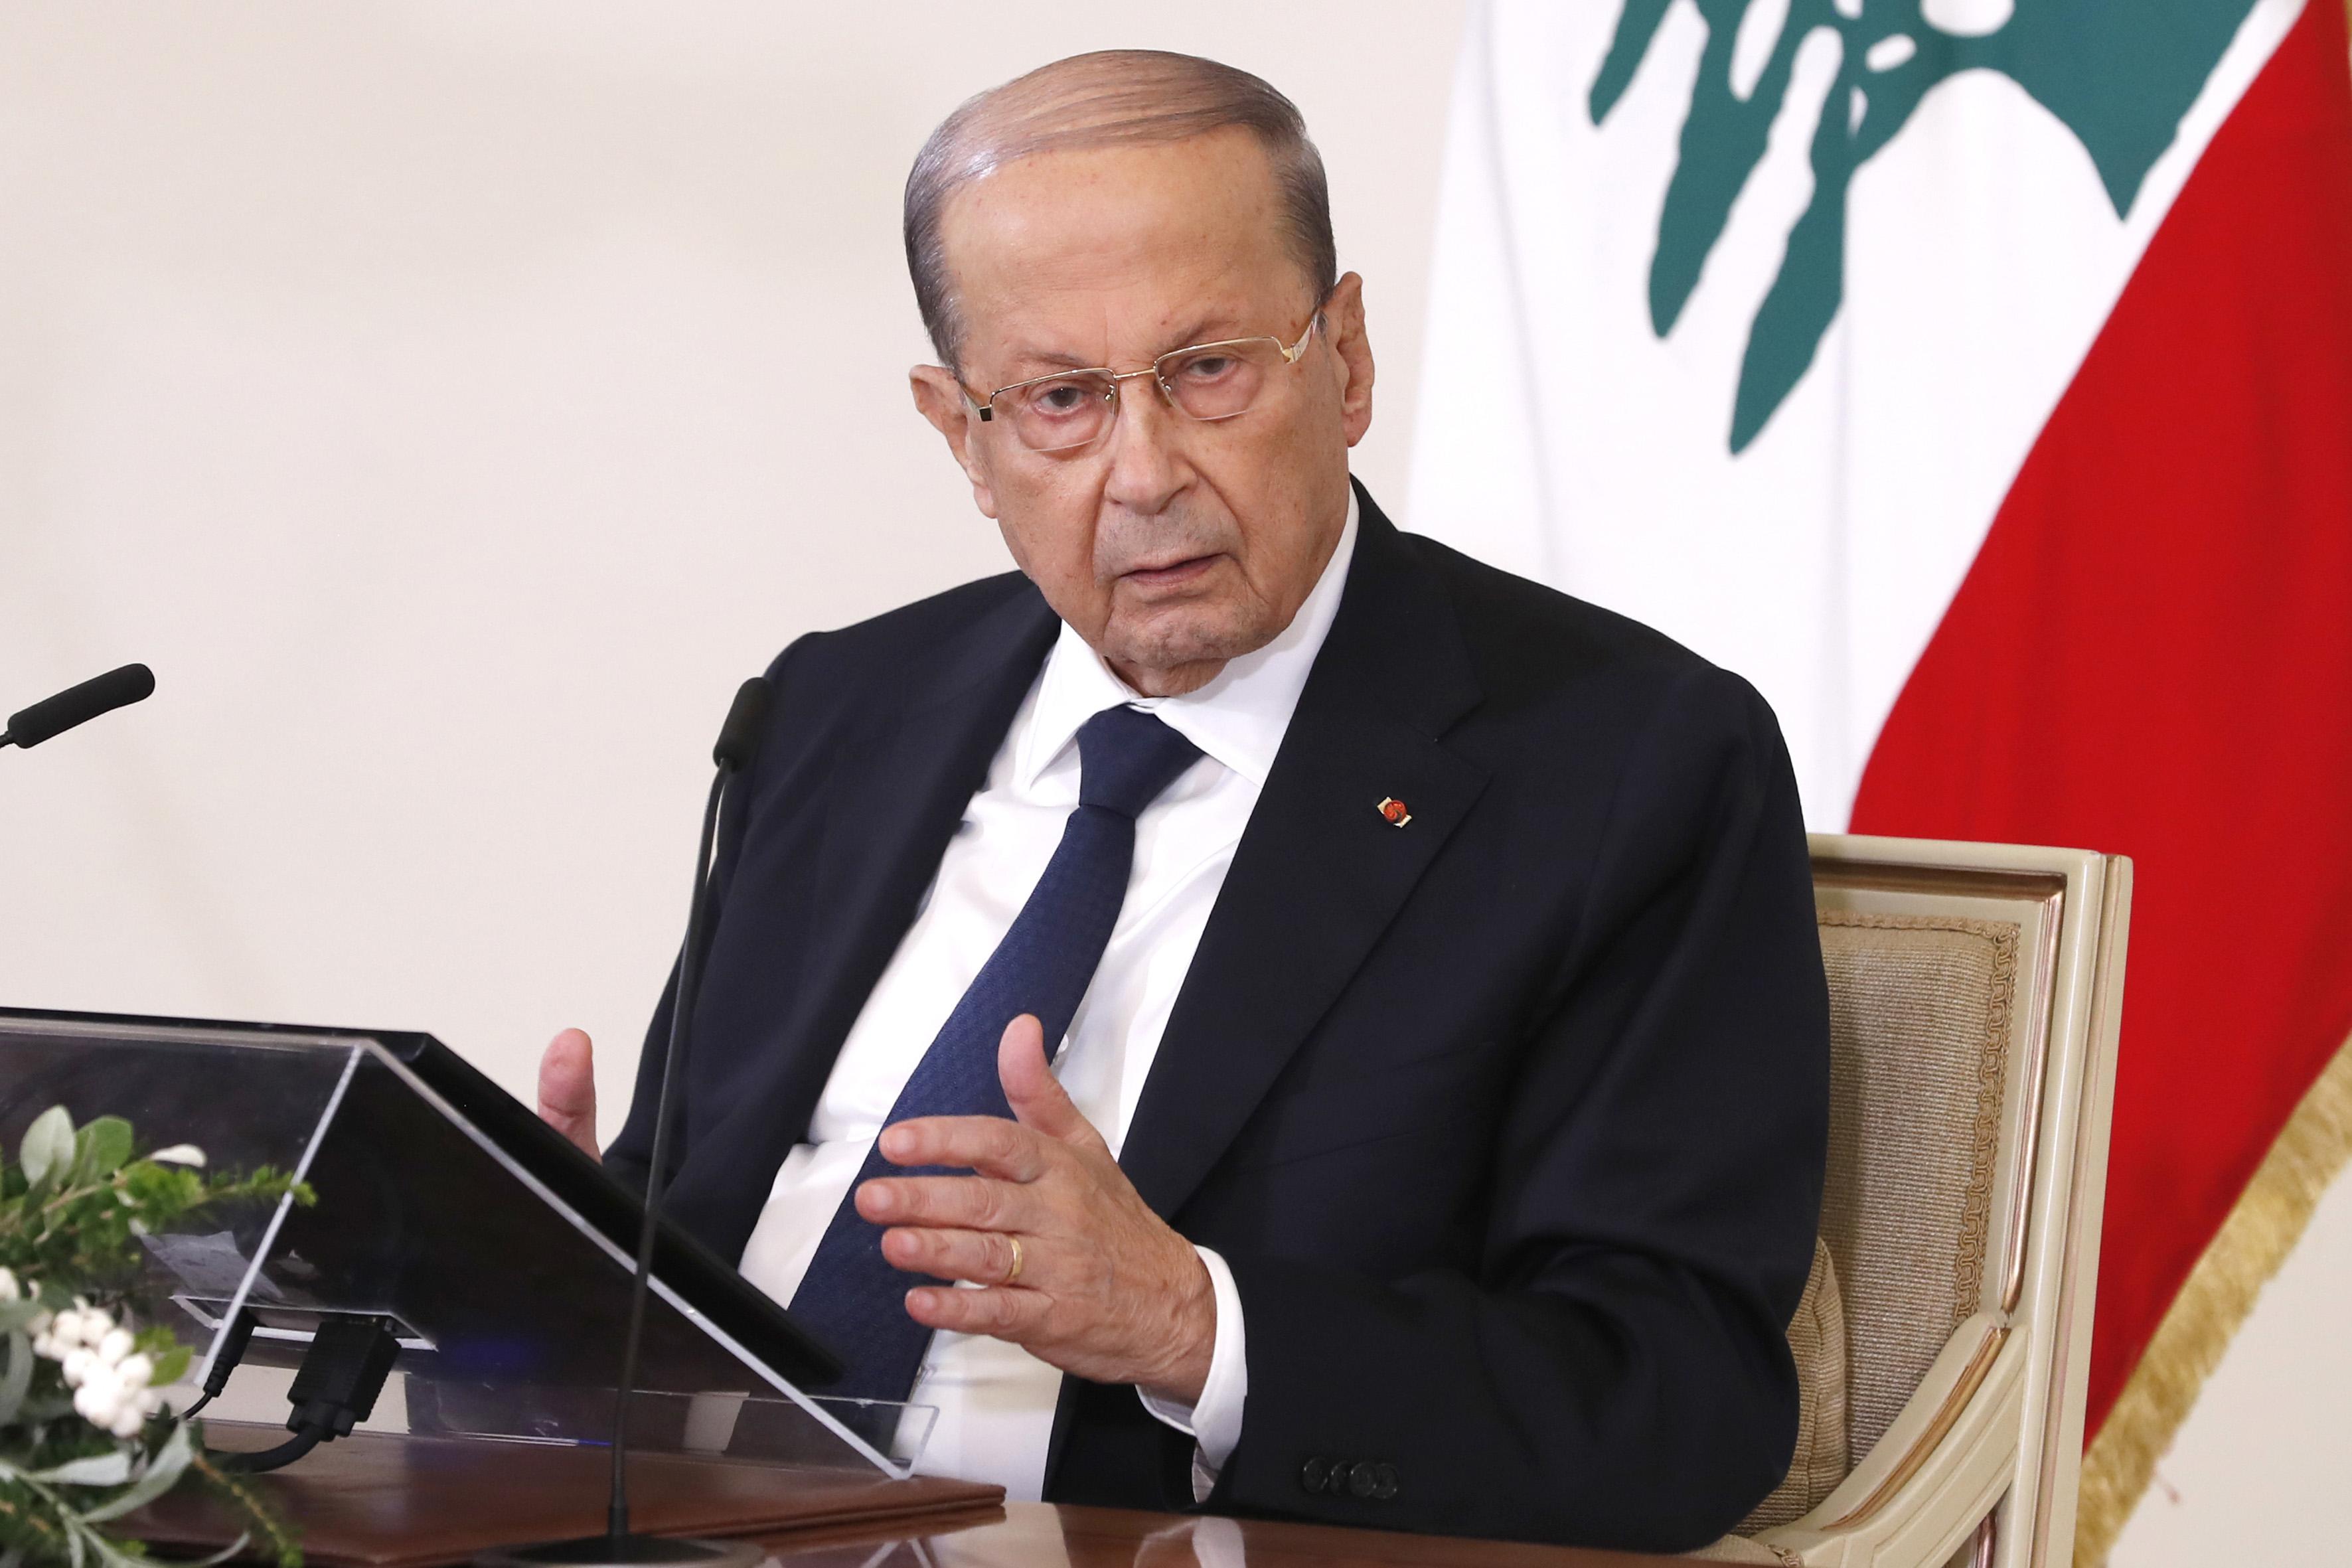 01 - President Michel Aoun press conference 20 oct 2020 (3)